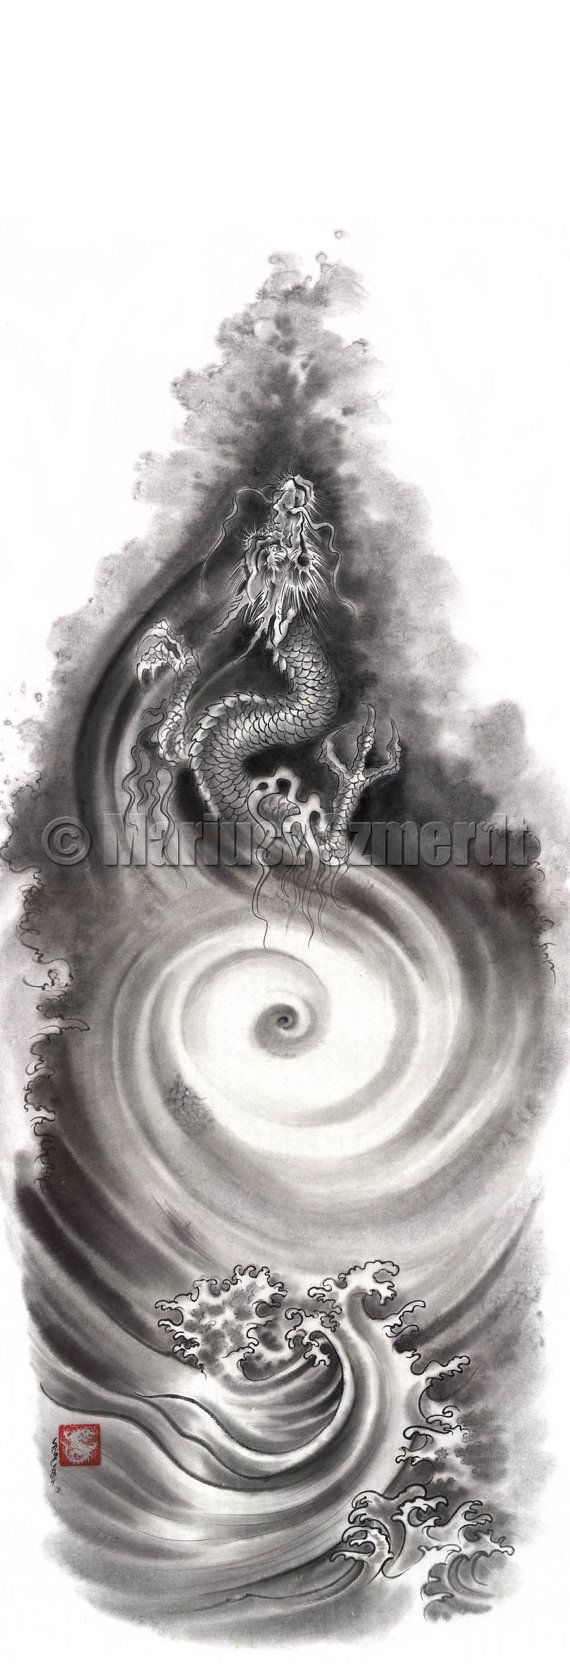 top ideas about dragon artwork dragon head top 25 ideas about dragon artwork dragon head dragon head tattoo and dragon art